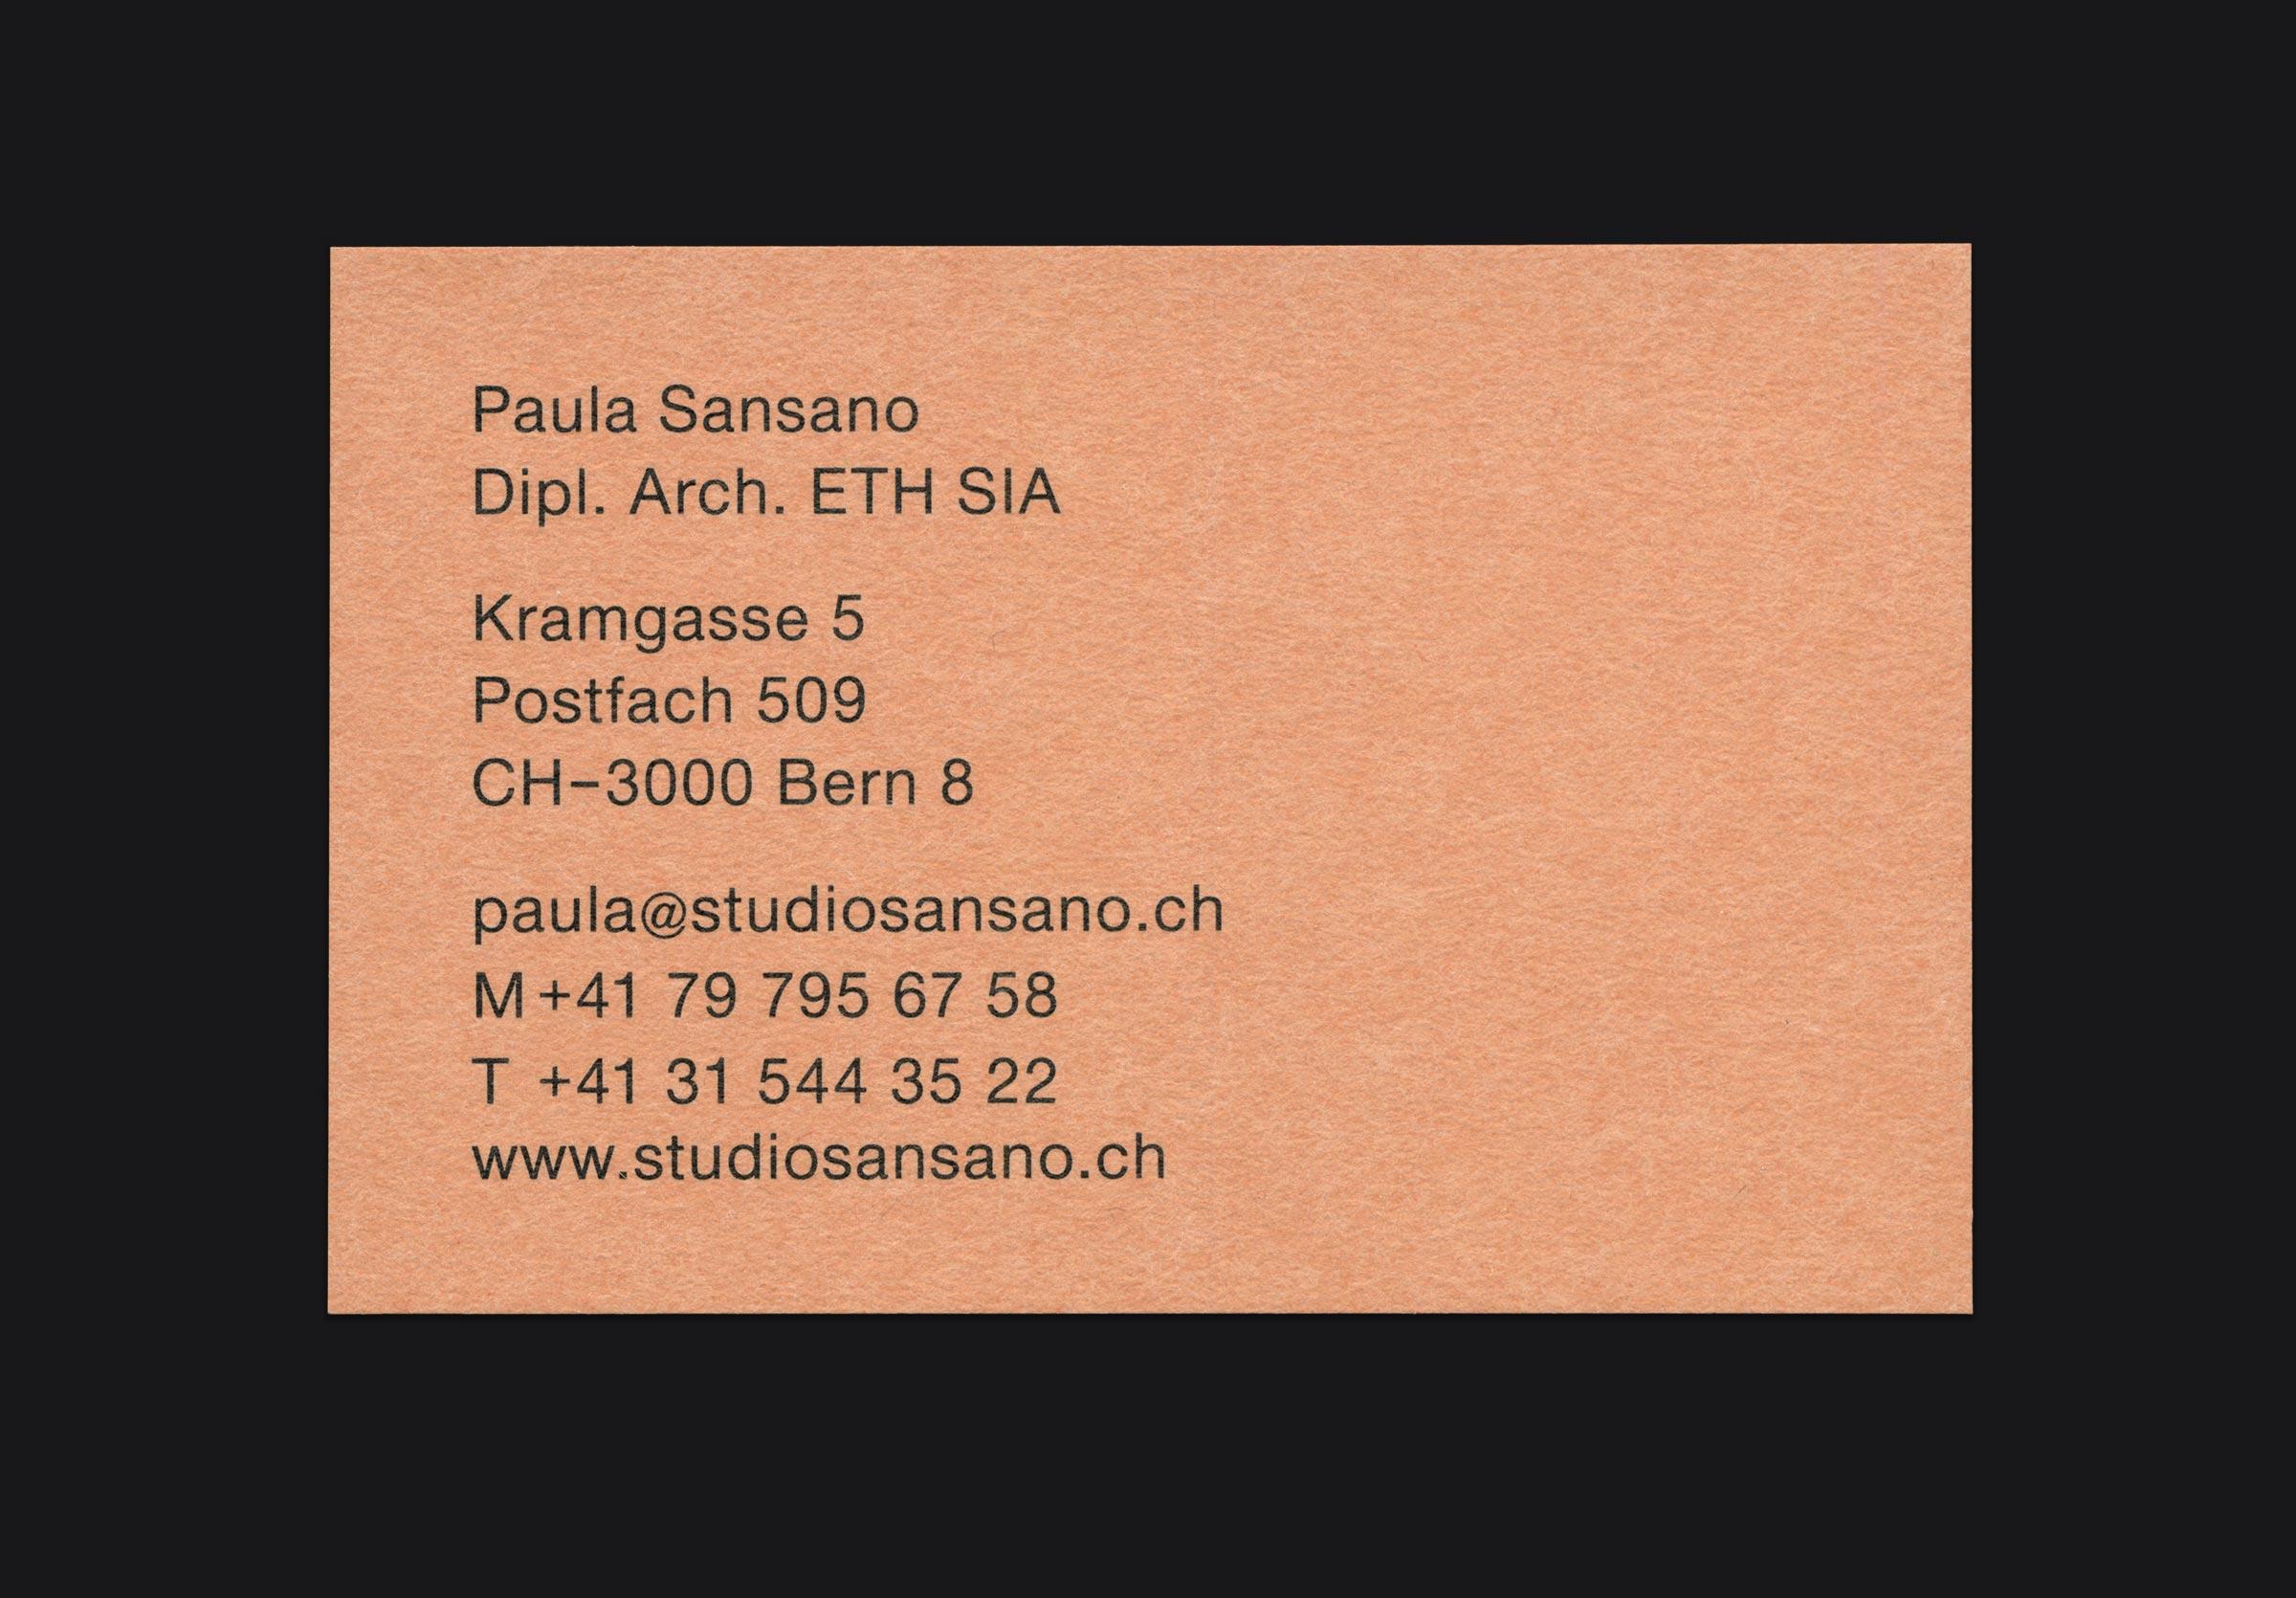 Studio Sansano Corporate Design ©Atelier Pol